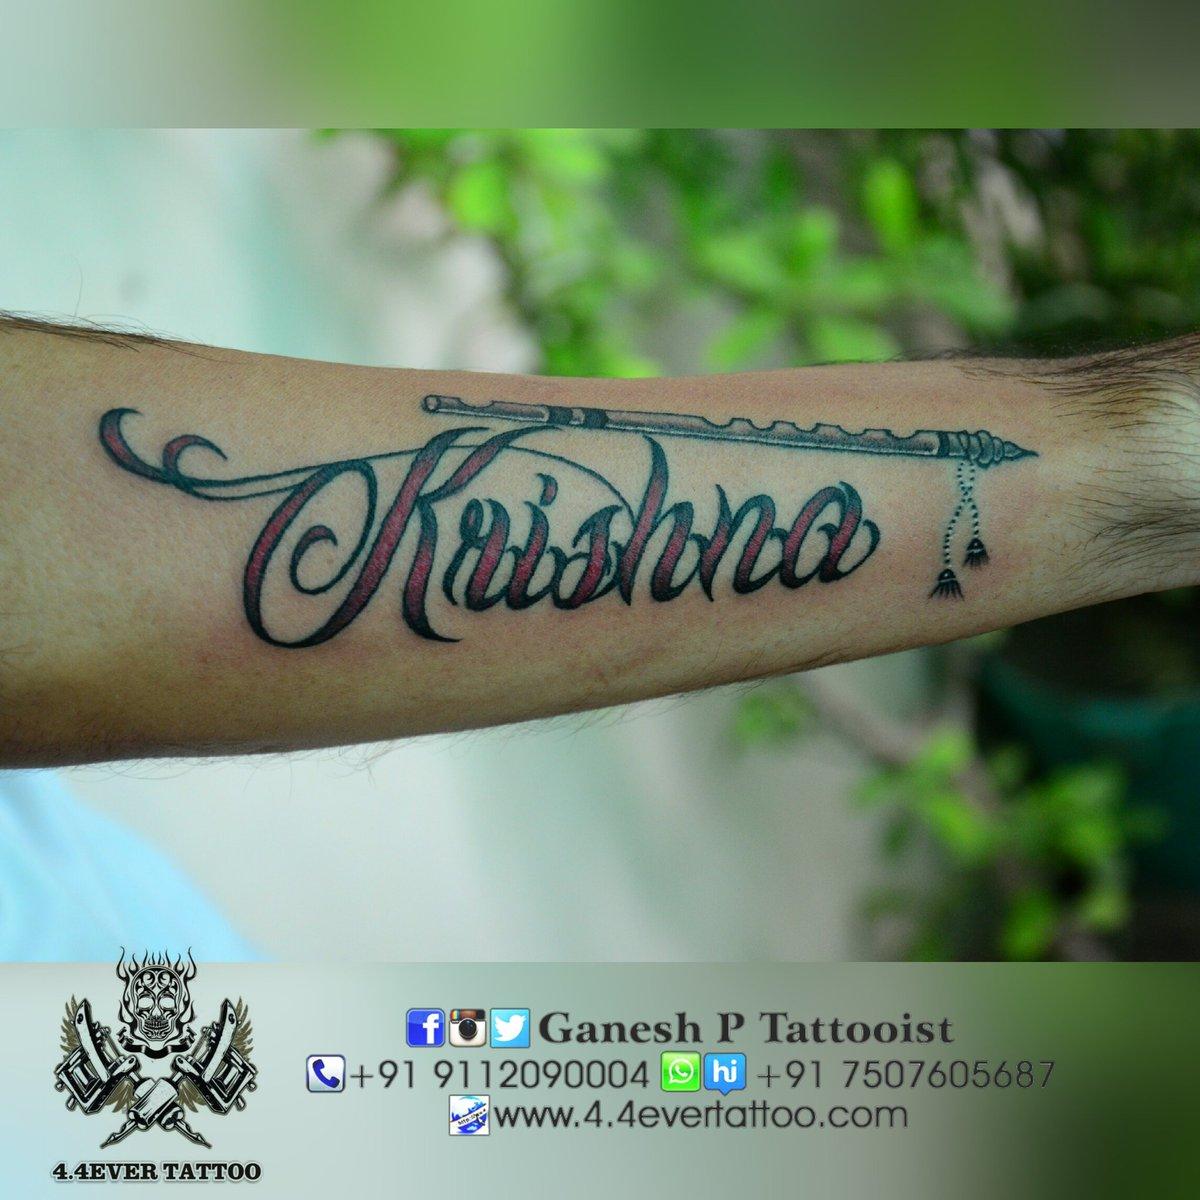 Ganesh P Tattooist On Twitter Krishna With Bansi Colorfull